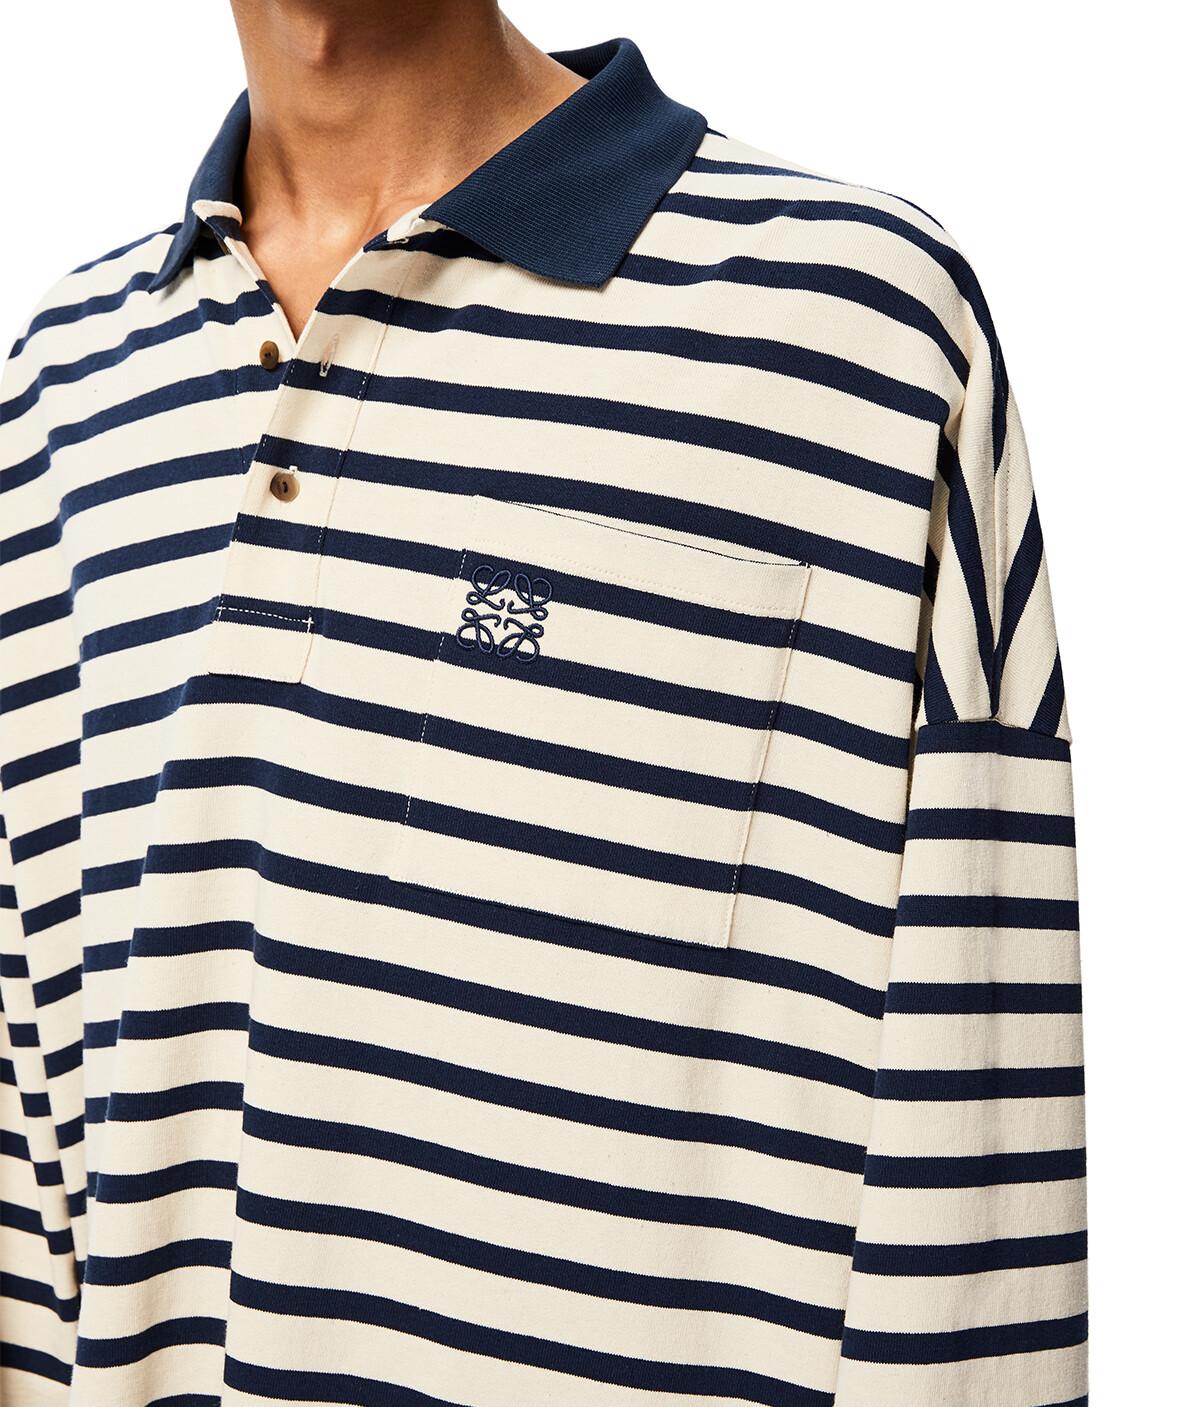 LOEWE Oversize Stripe Polo Navy Blue/Ecru front